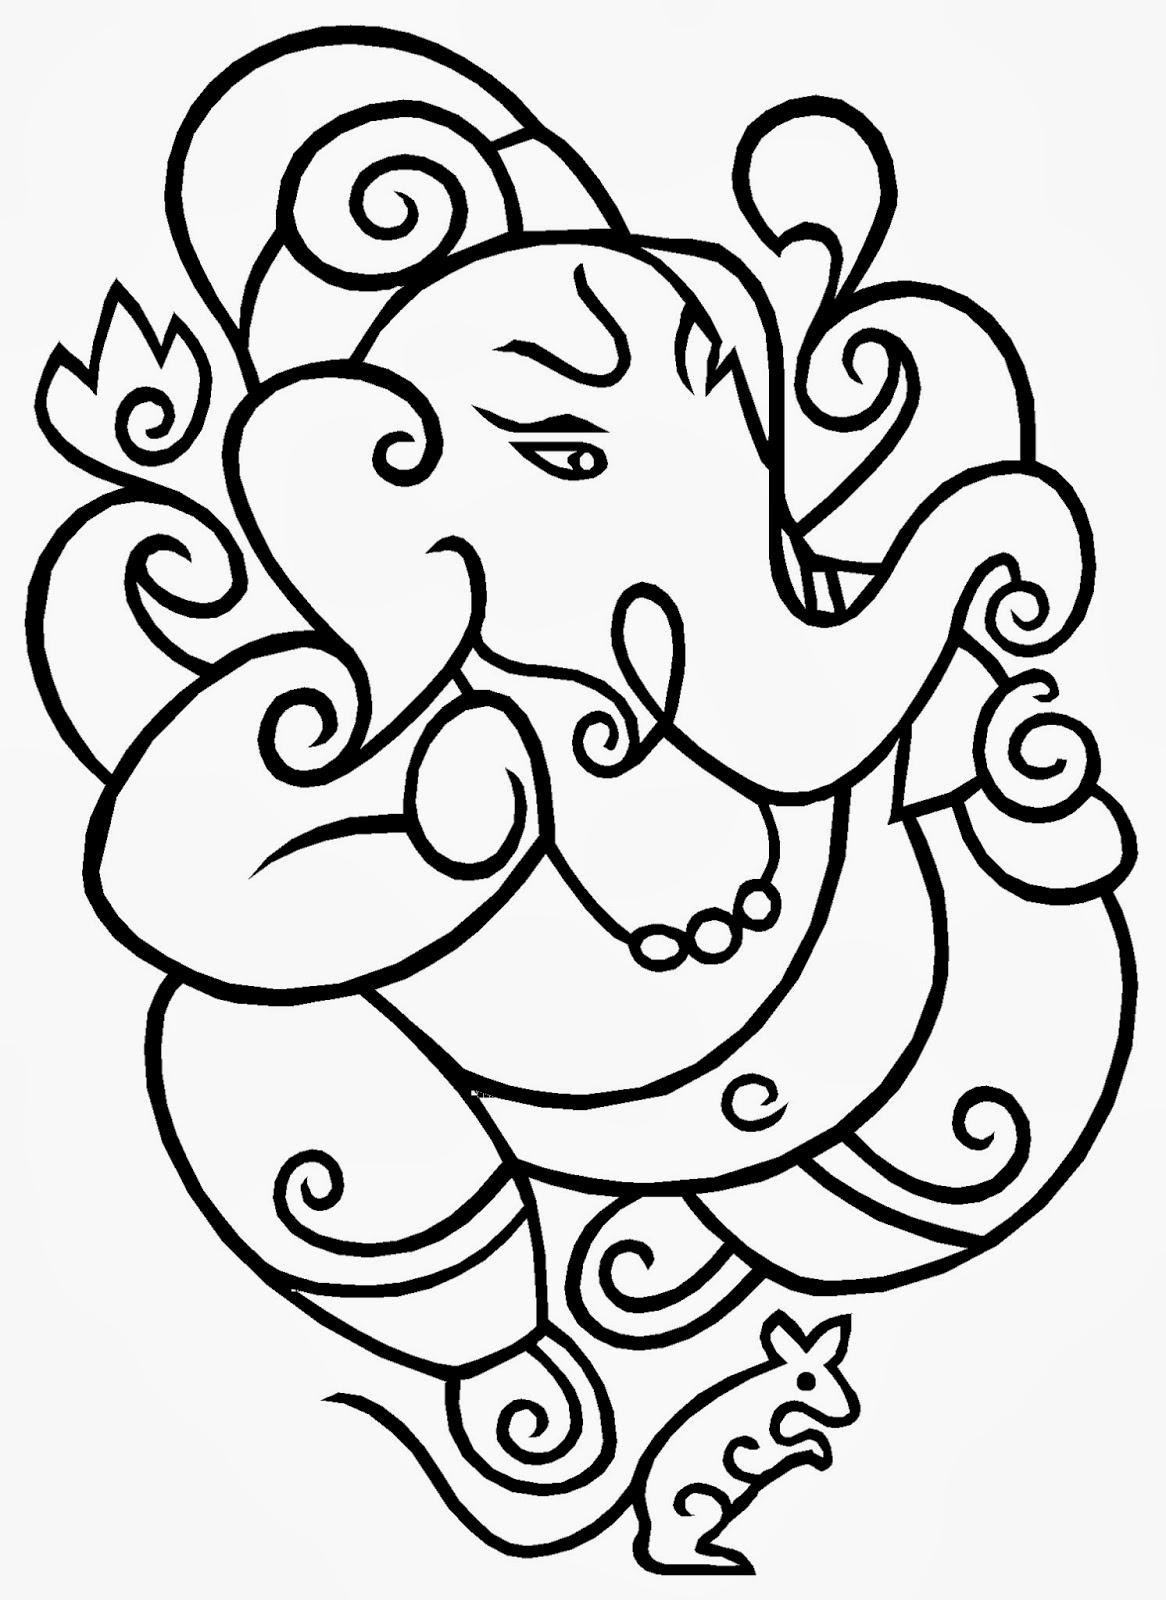 Line Art Vinayagar : Best collection store sri ganesh